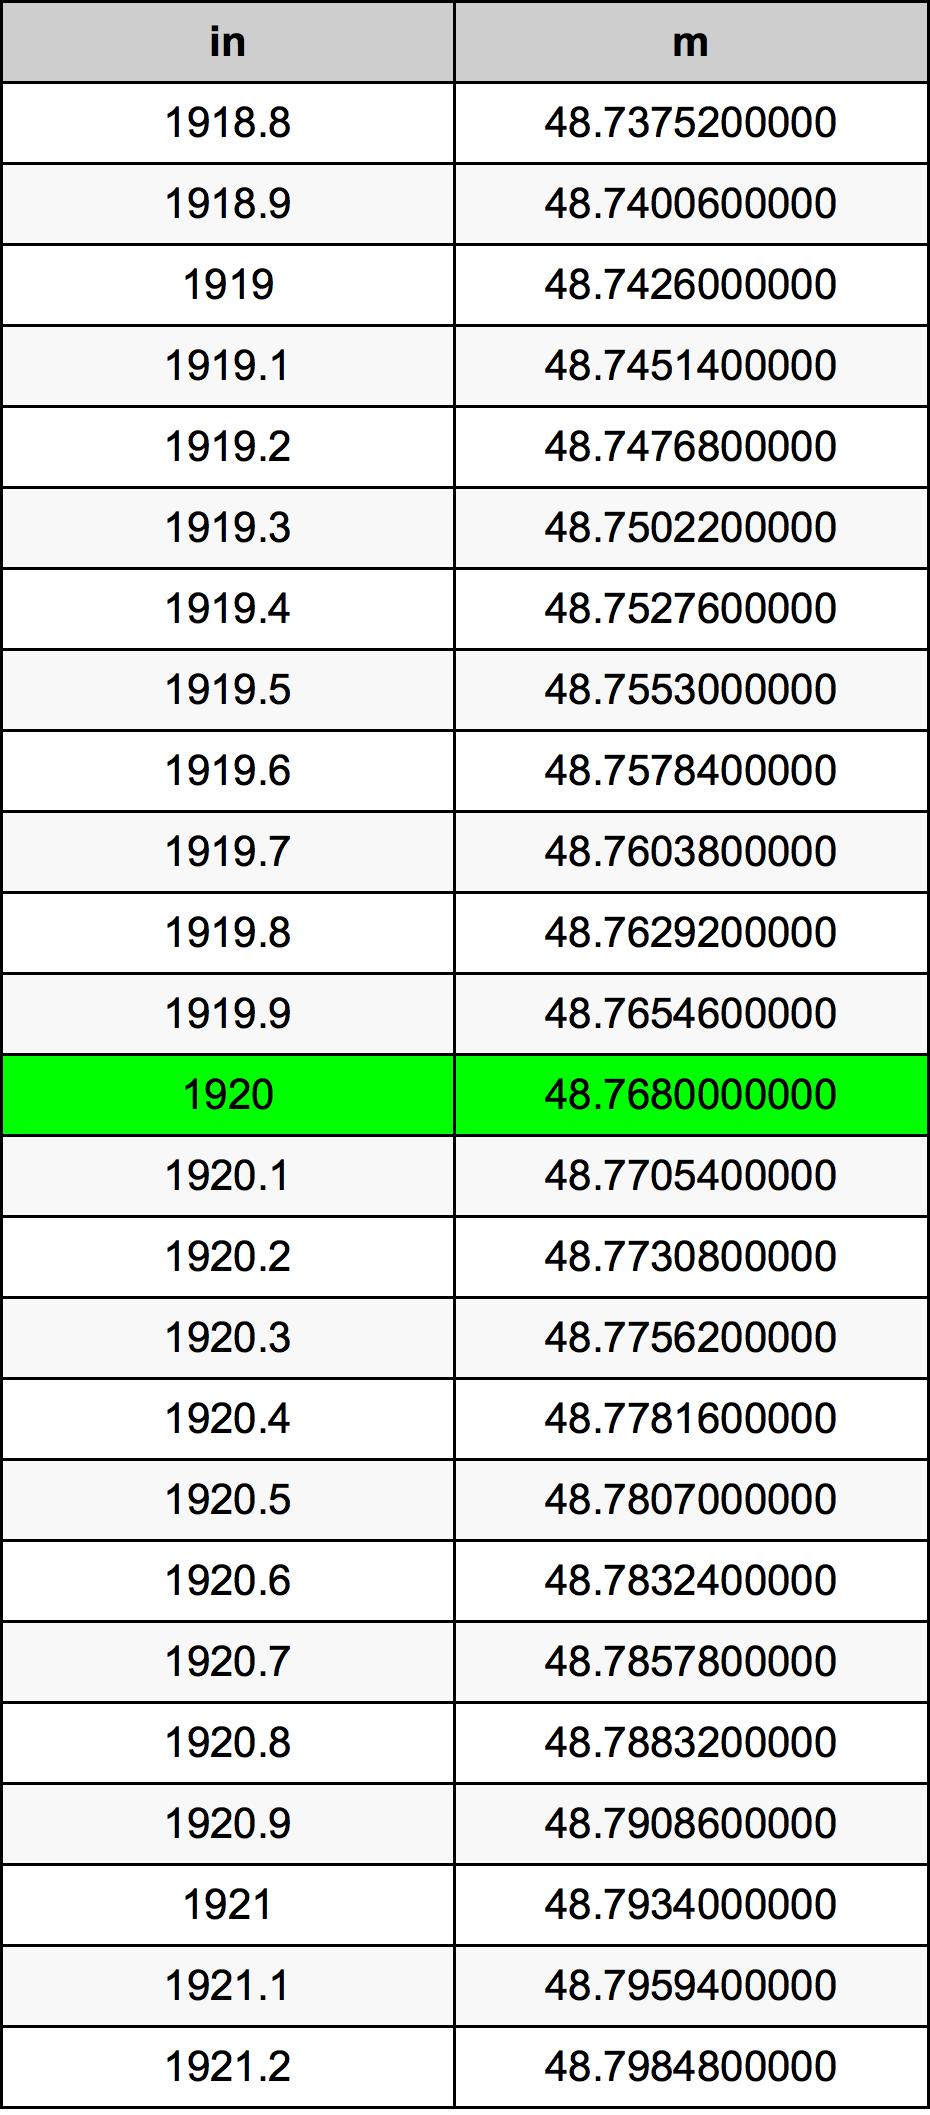 1920 Inch konverteringstabell